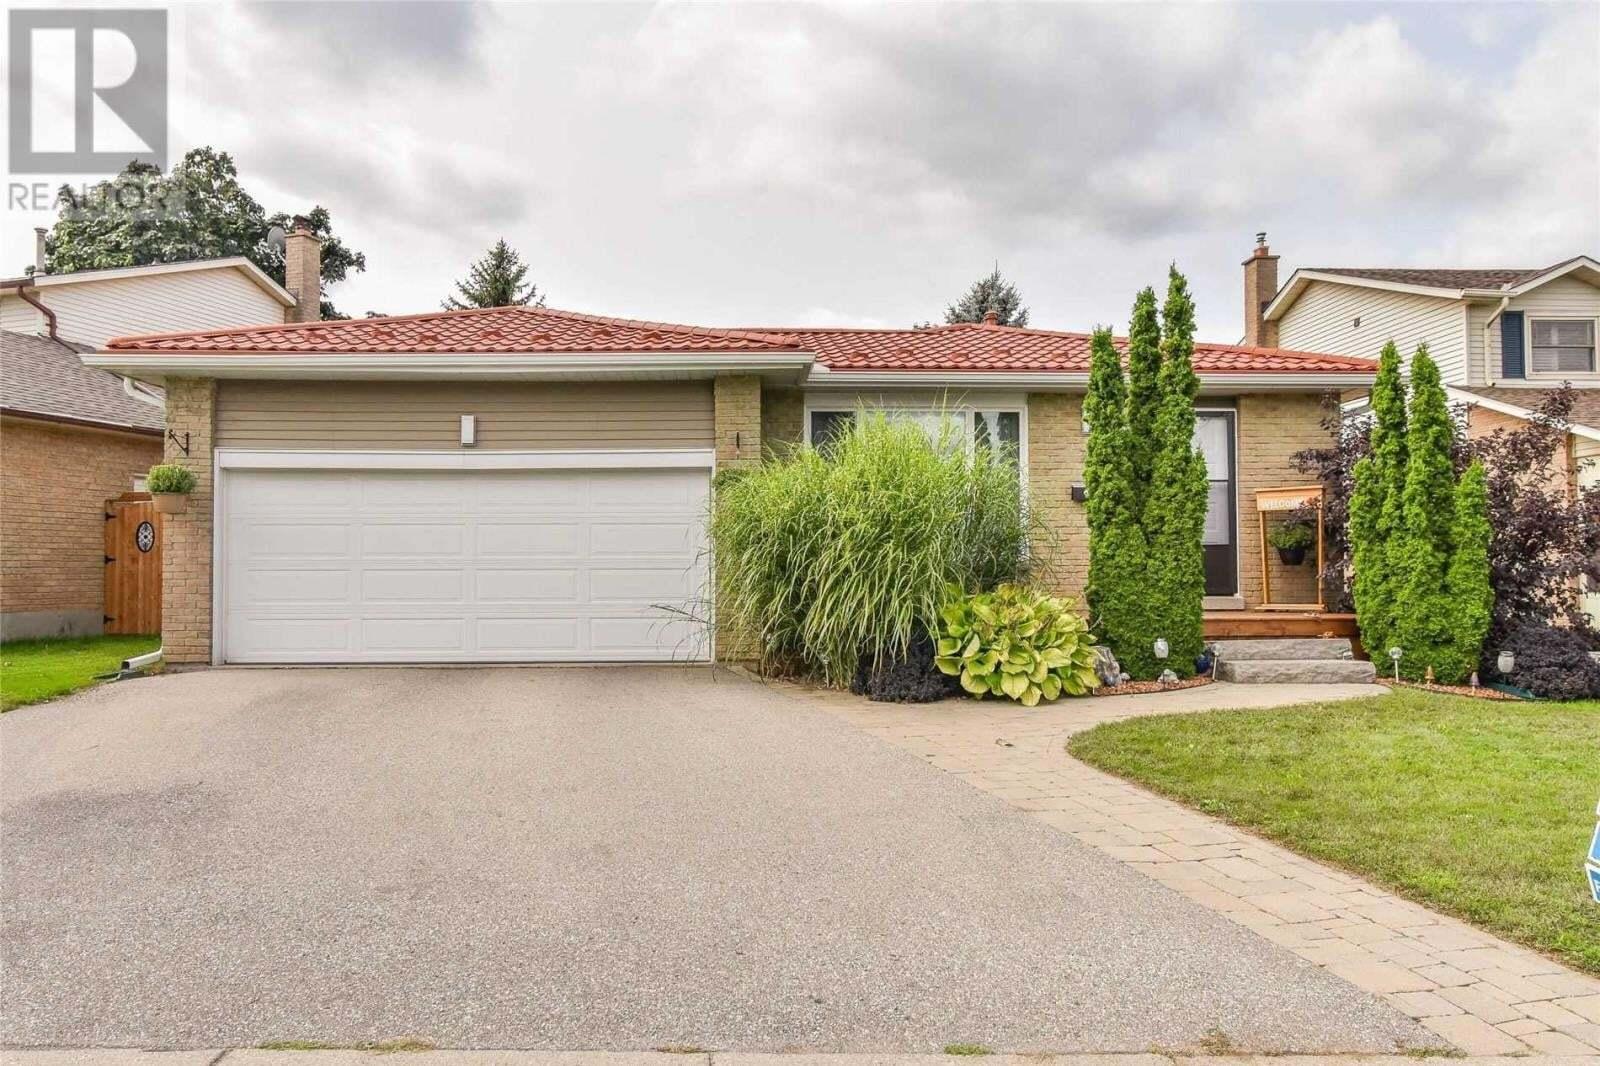 House for sale at 70 Foxridge Dr West Cambridge Ontario - MLS: X4912274